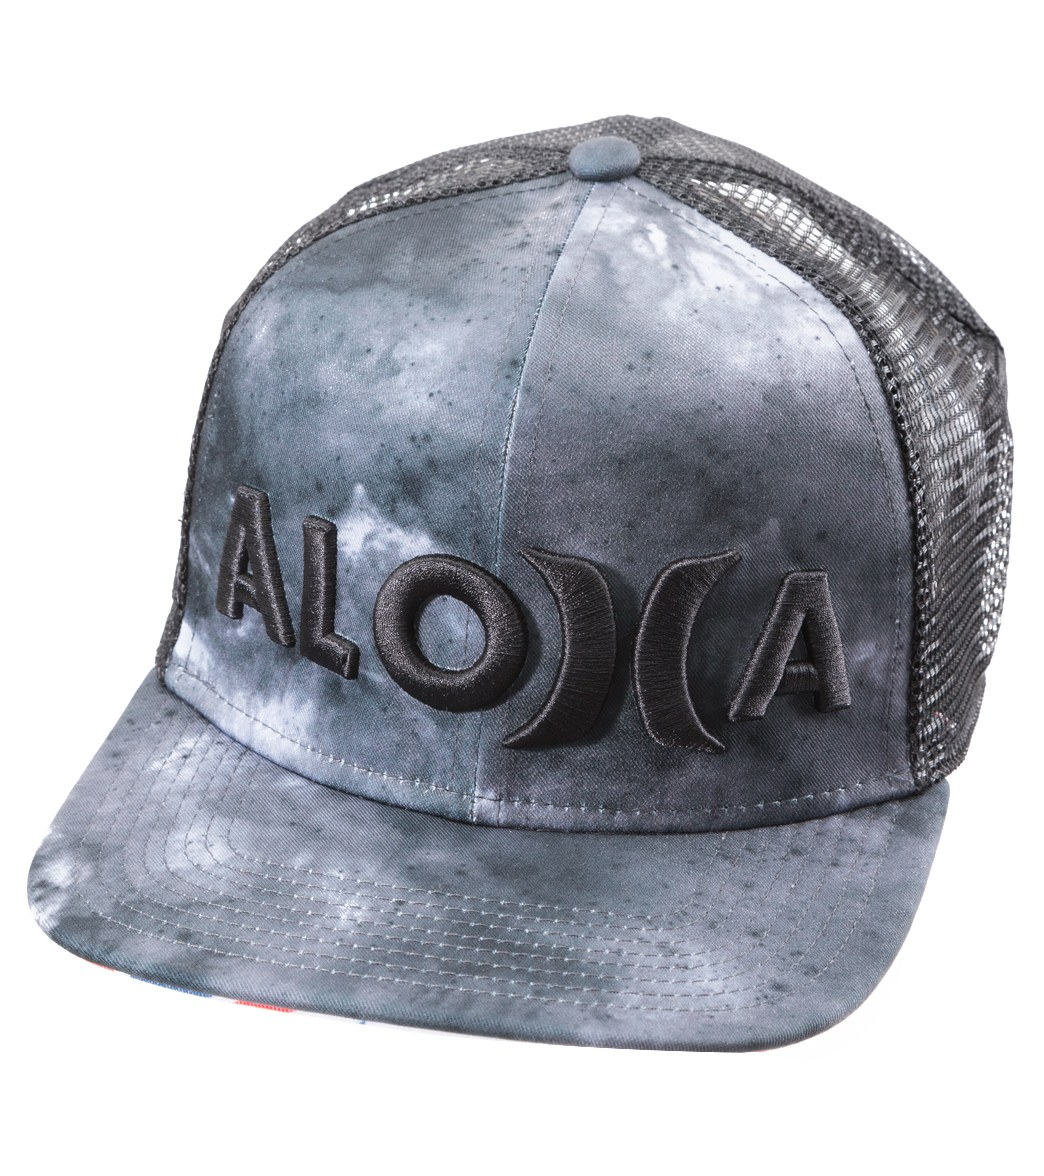 e2c59024aa0 Hurley Men s JJF III Nebula Trucker Hat at SwimOutlet.com